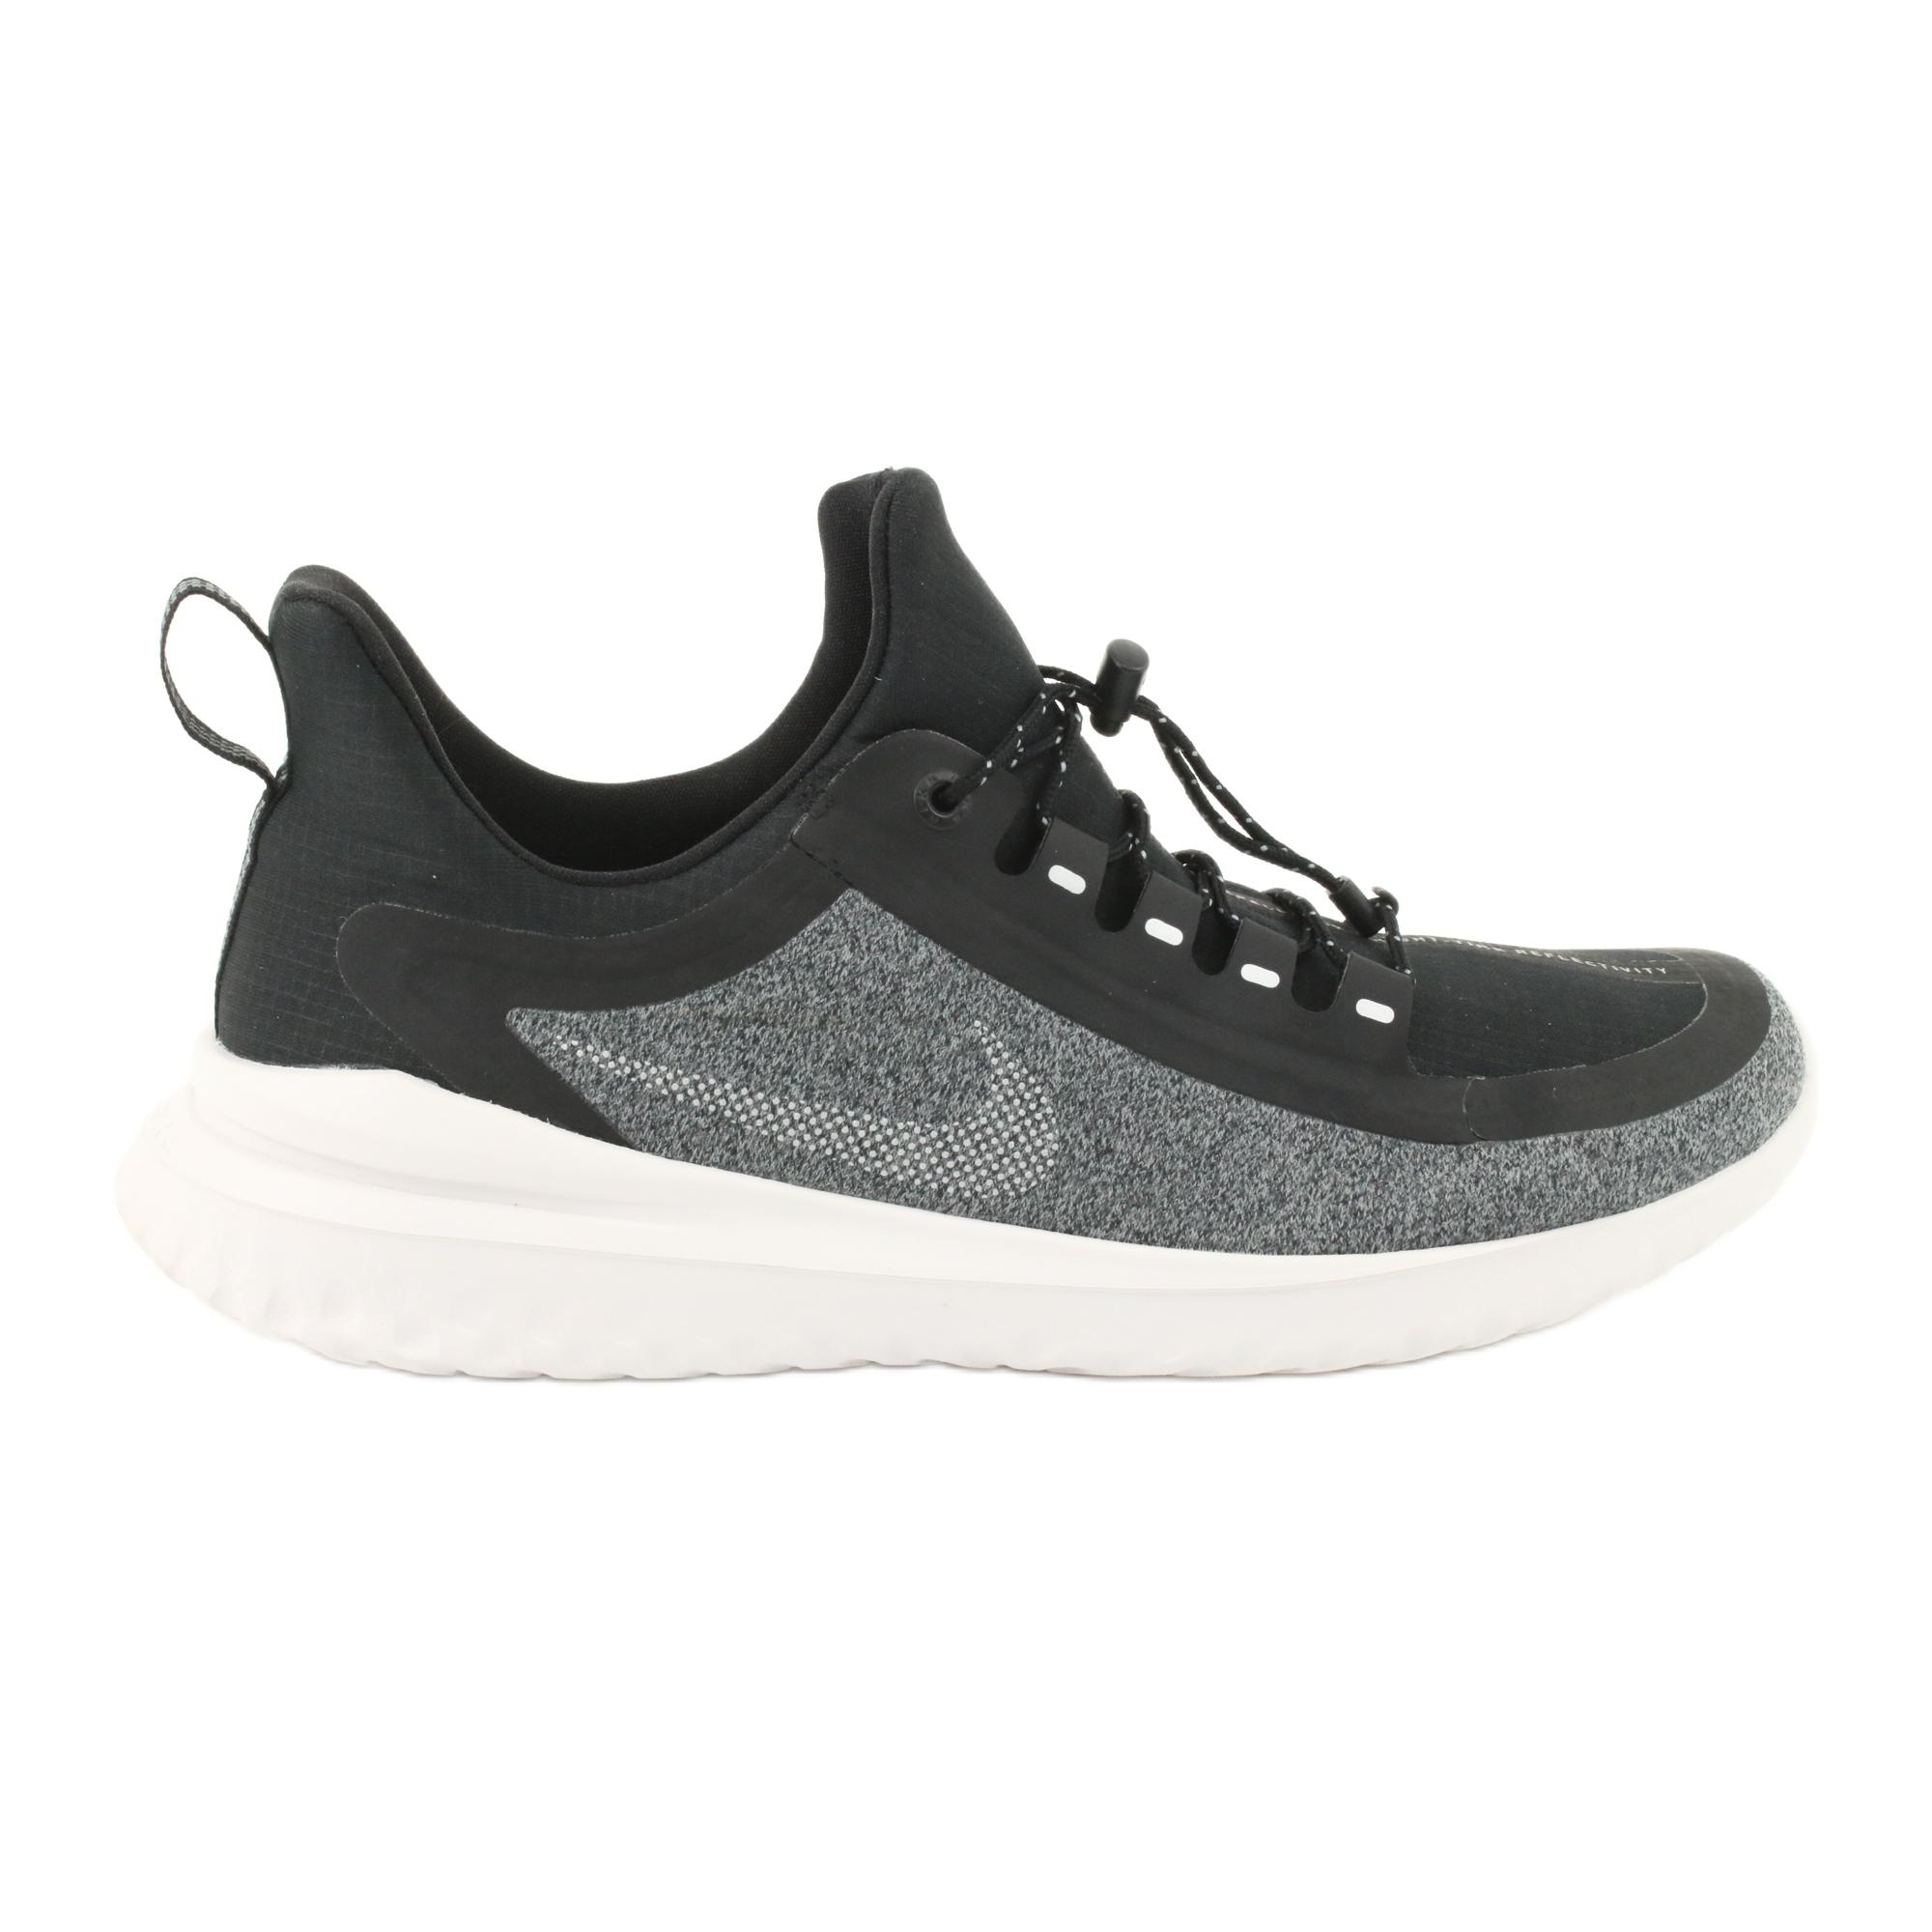 Nike Renew Rival Női Futó cipő Cipő1.hu Férfi, női és